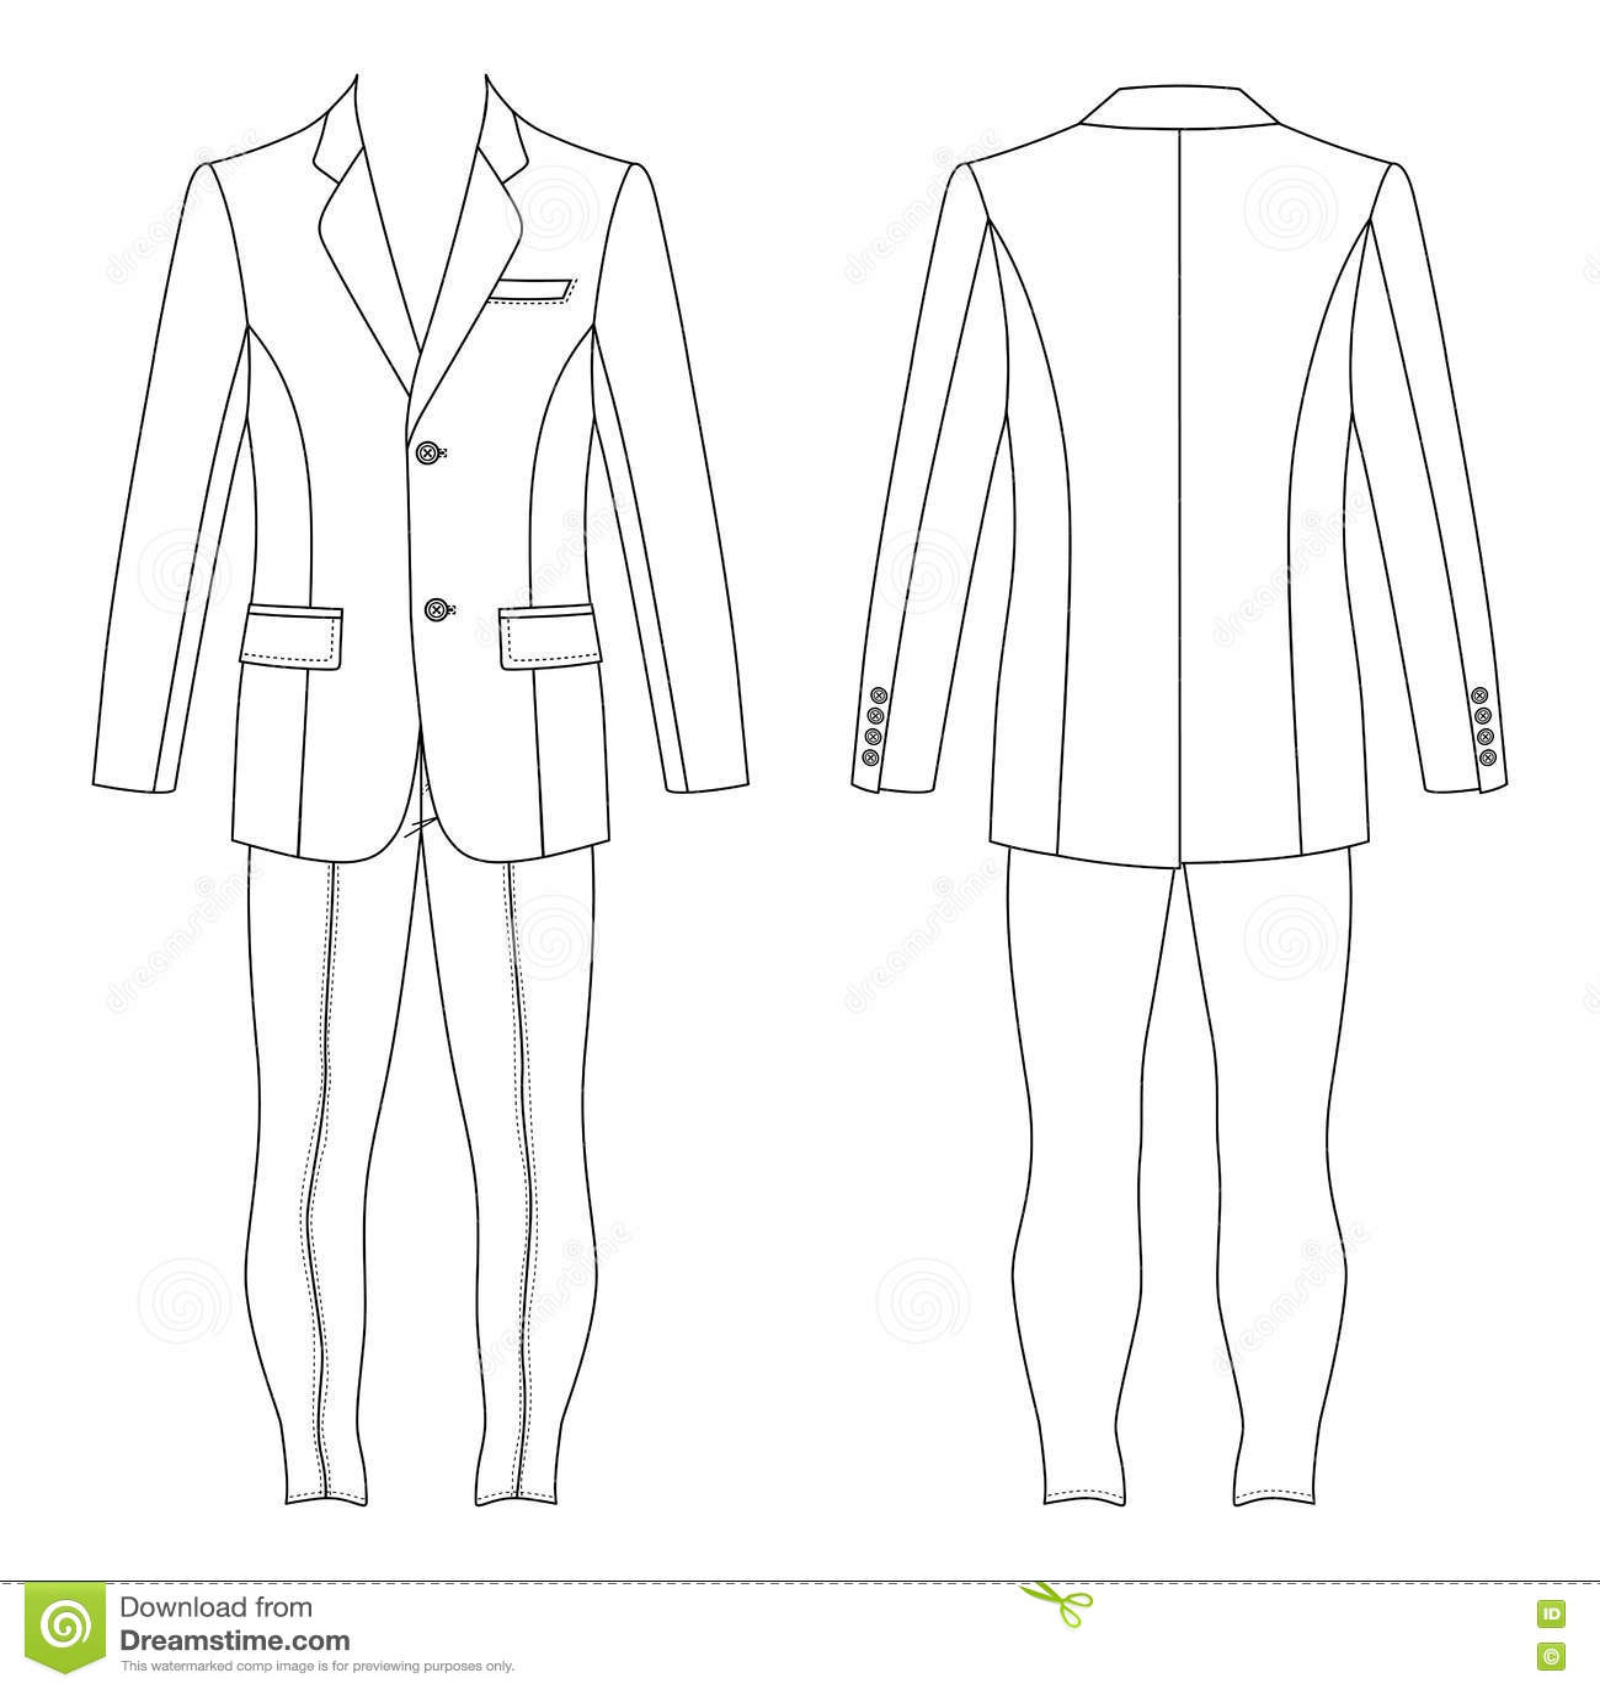 24eee98d45 Man`s suit stock vector. Illustration of sketch, outline - 81405575